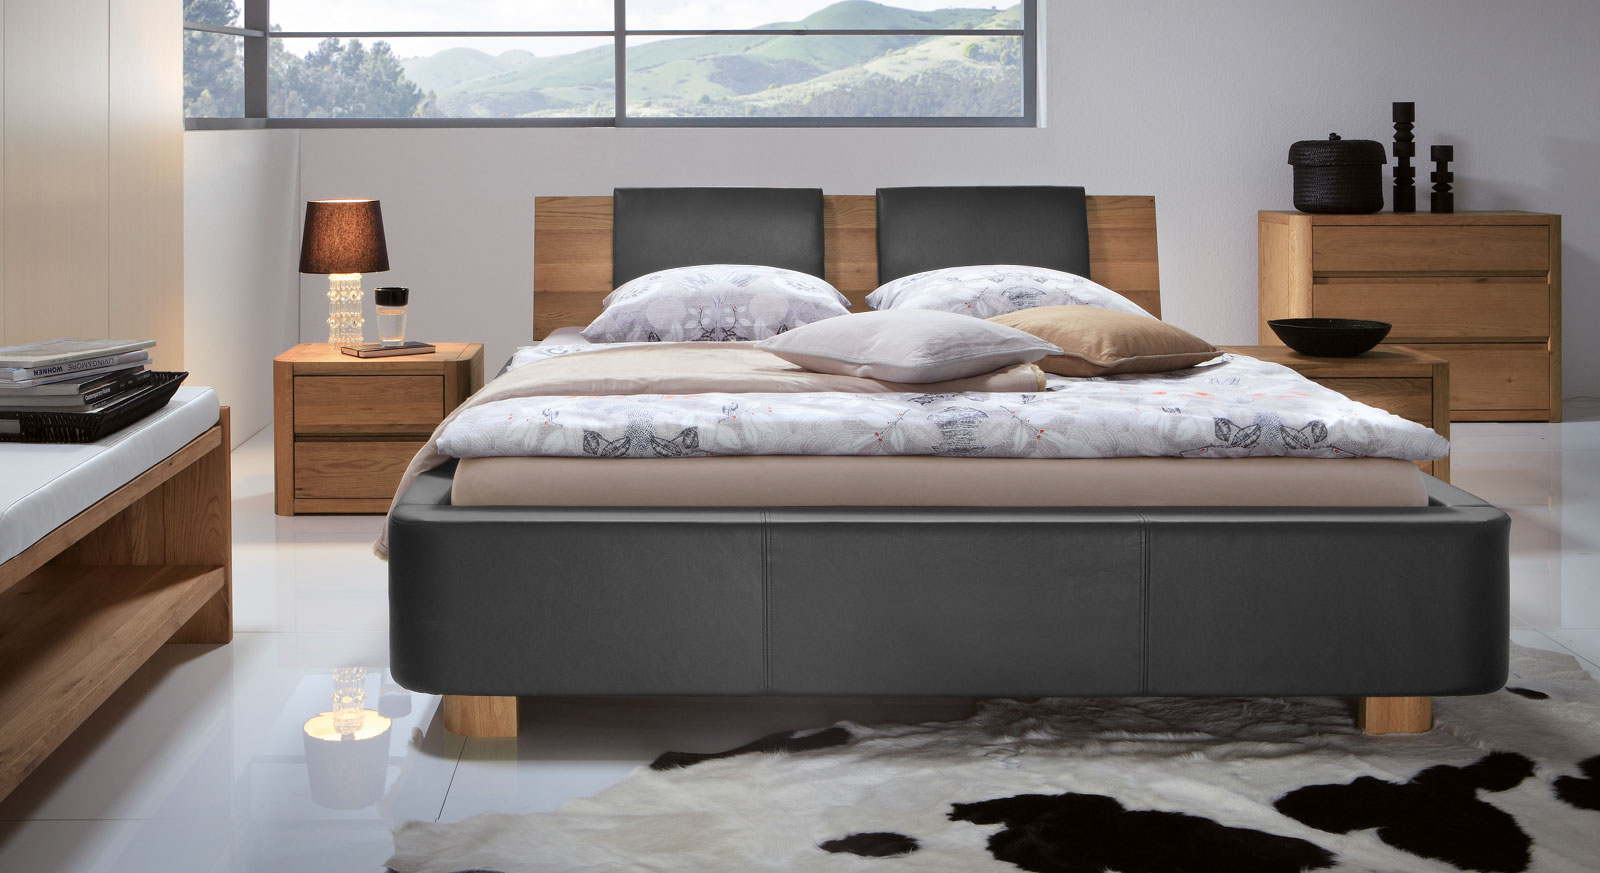 schlafzimmer petrol grau inspiration f r die gestaltung der besten r ume. Black Bedroom Furniture Sets. Home Design Ideas